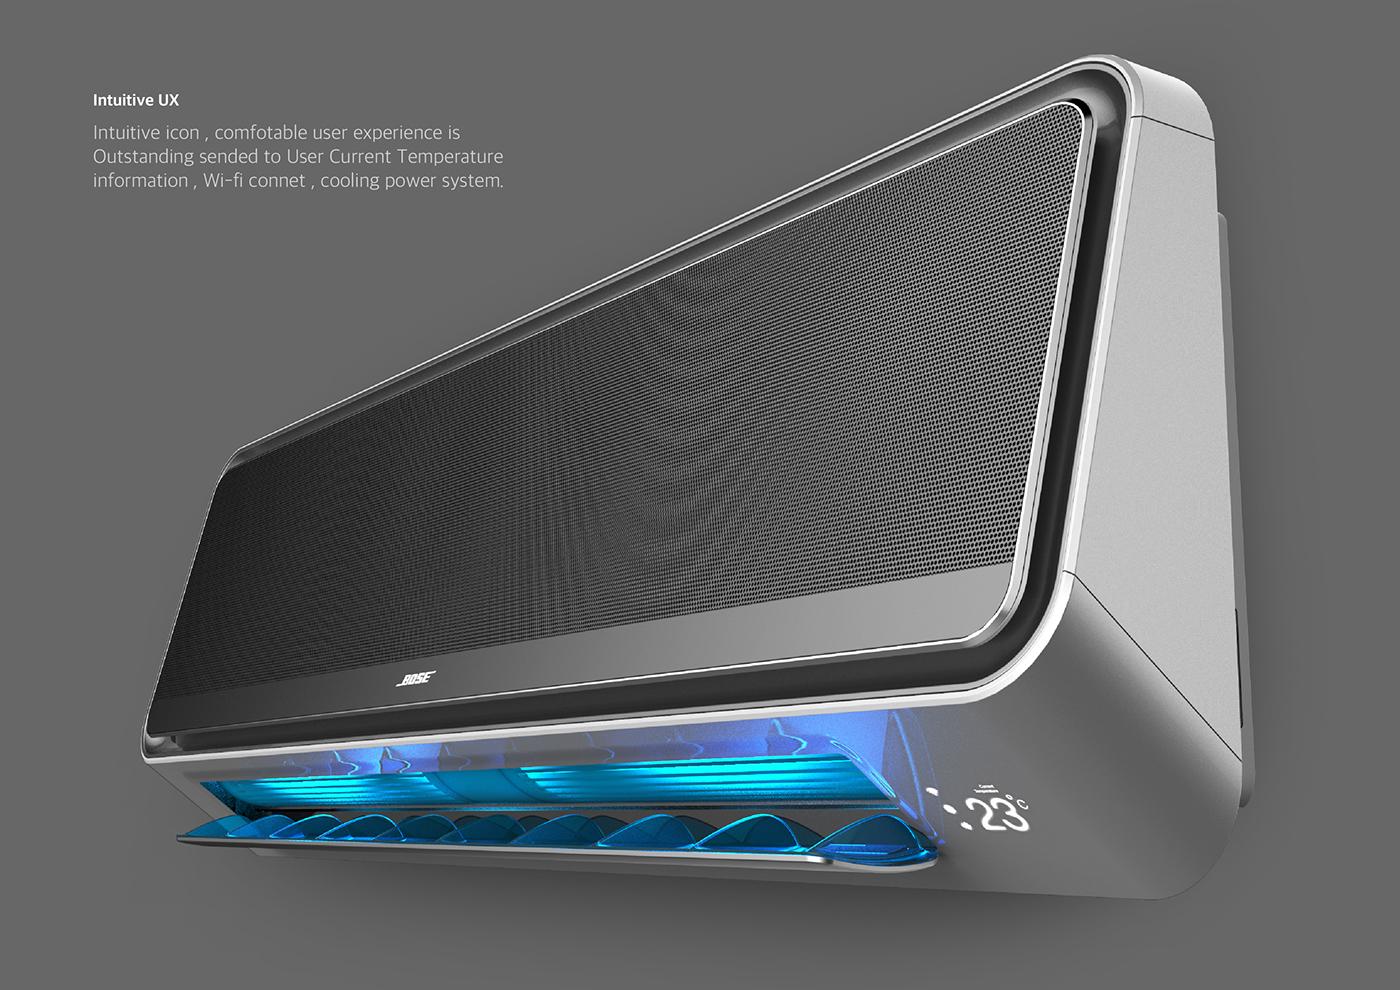 productdesign industrialdesign sketch airconditioner 제품디자인 Bose design color material Air conditioner